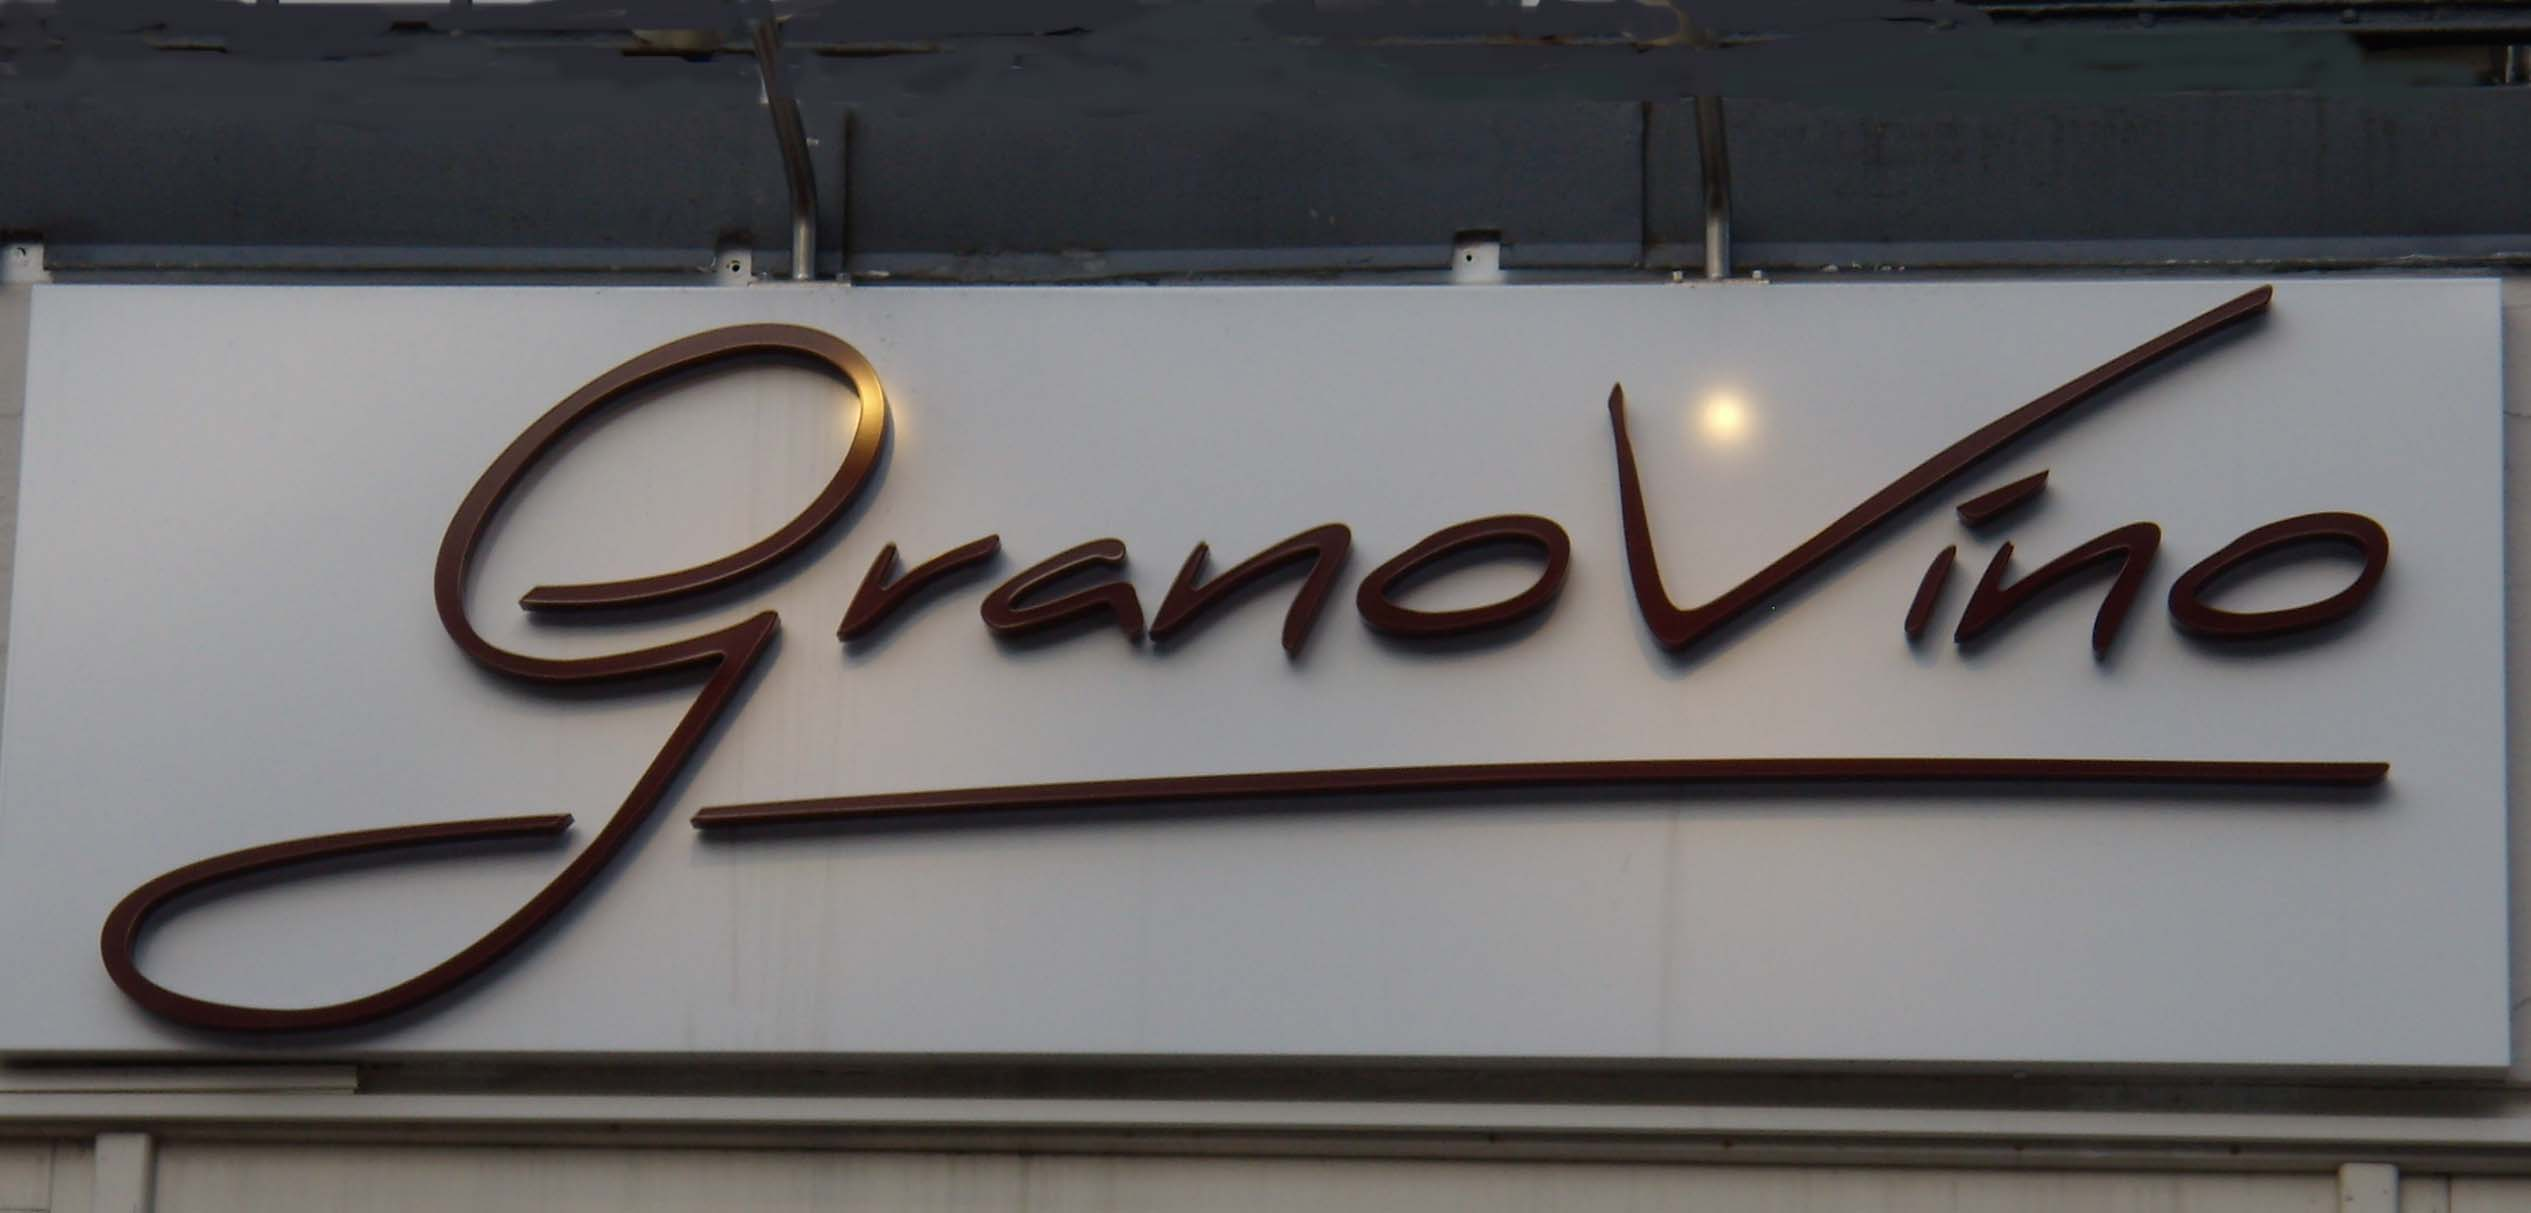 GranoVino- Eppendorf